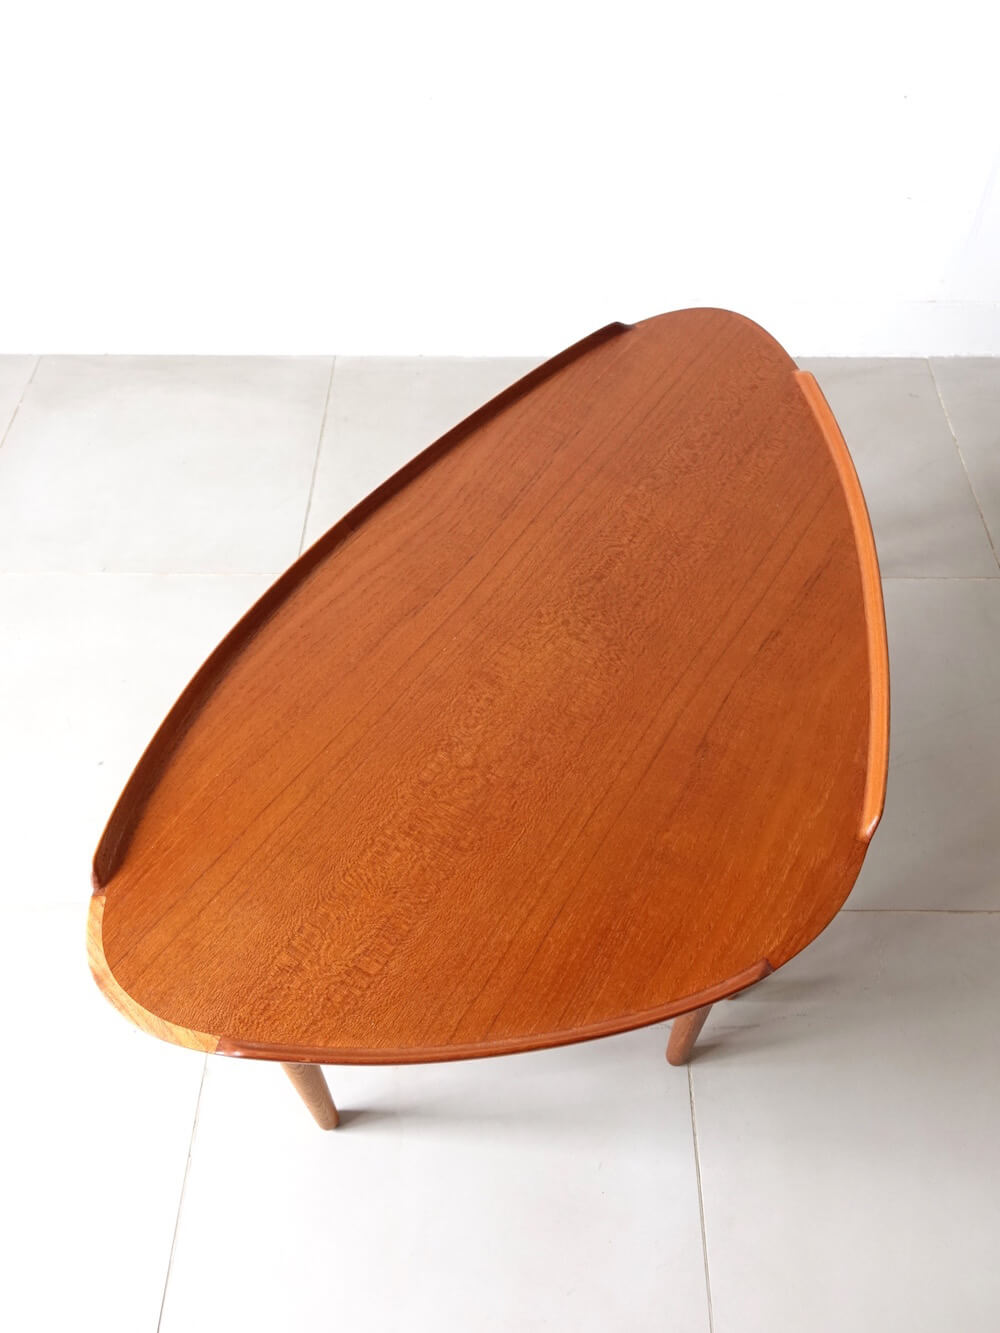 Coffee table by Arne Vodder for Sibast Møbler